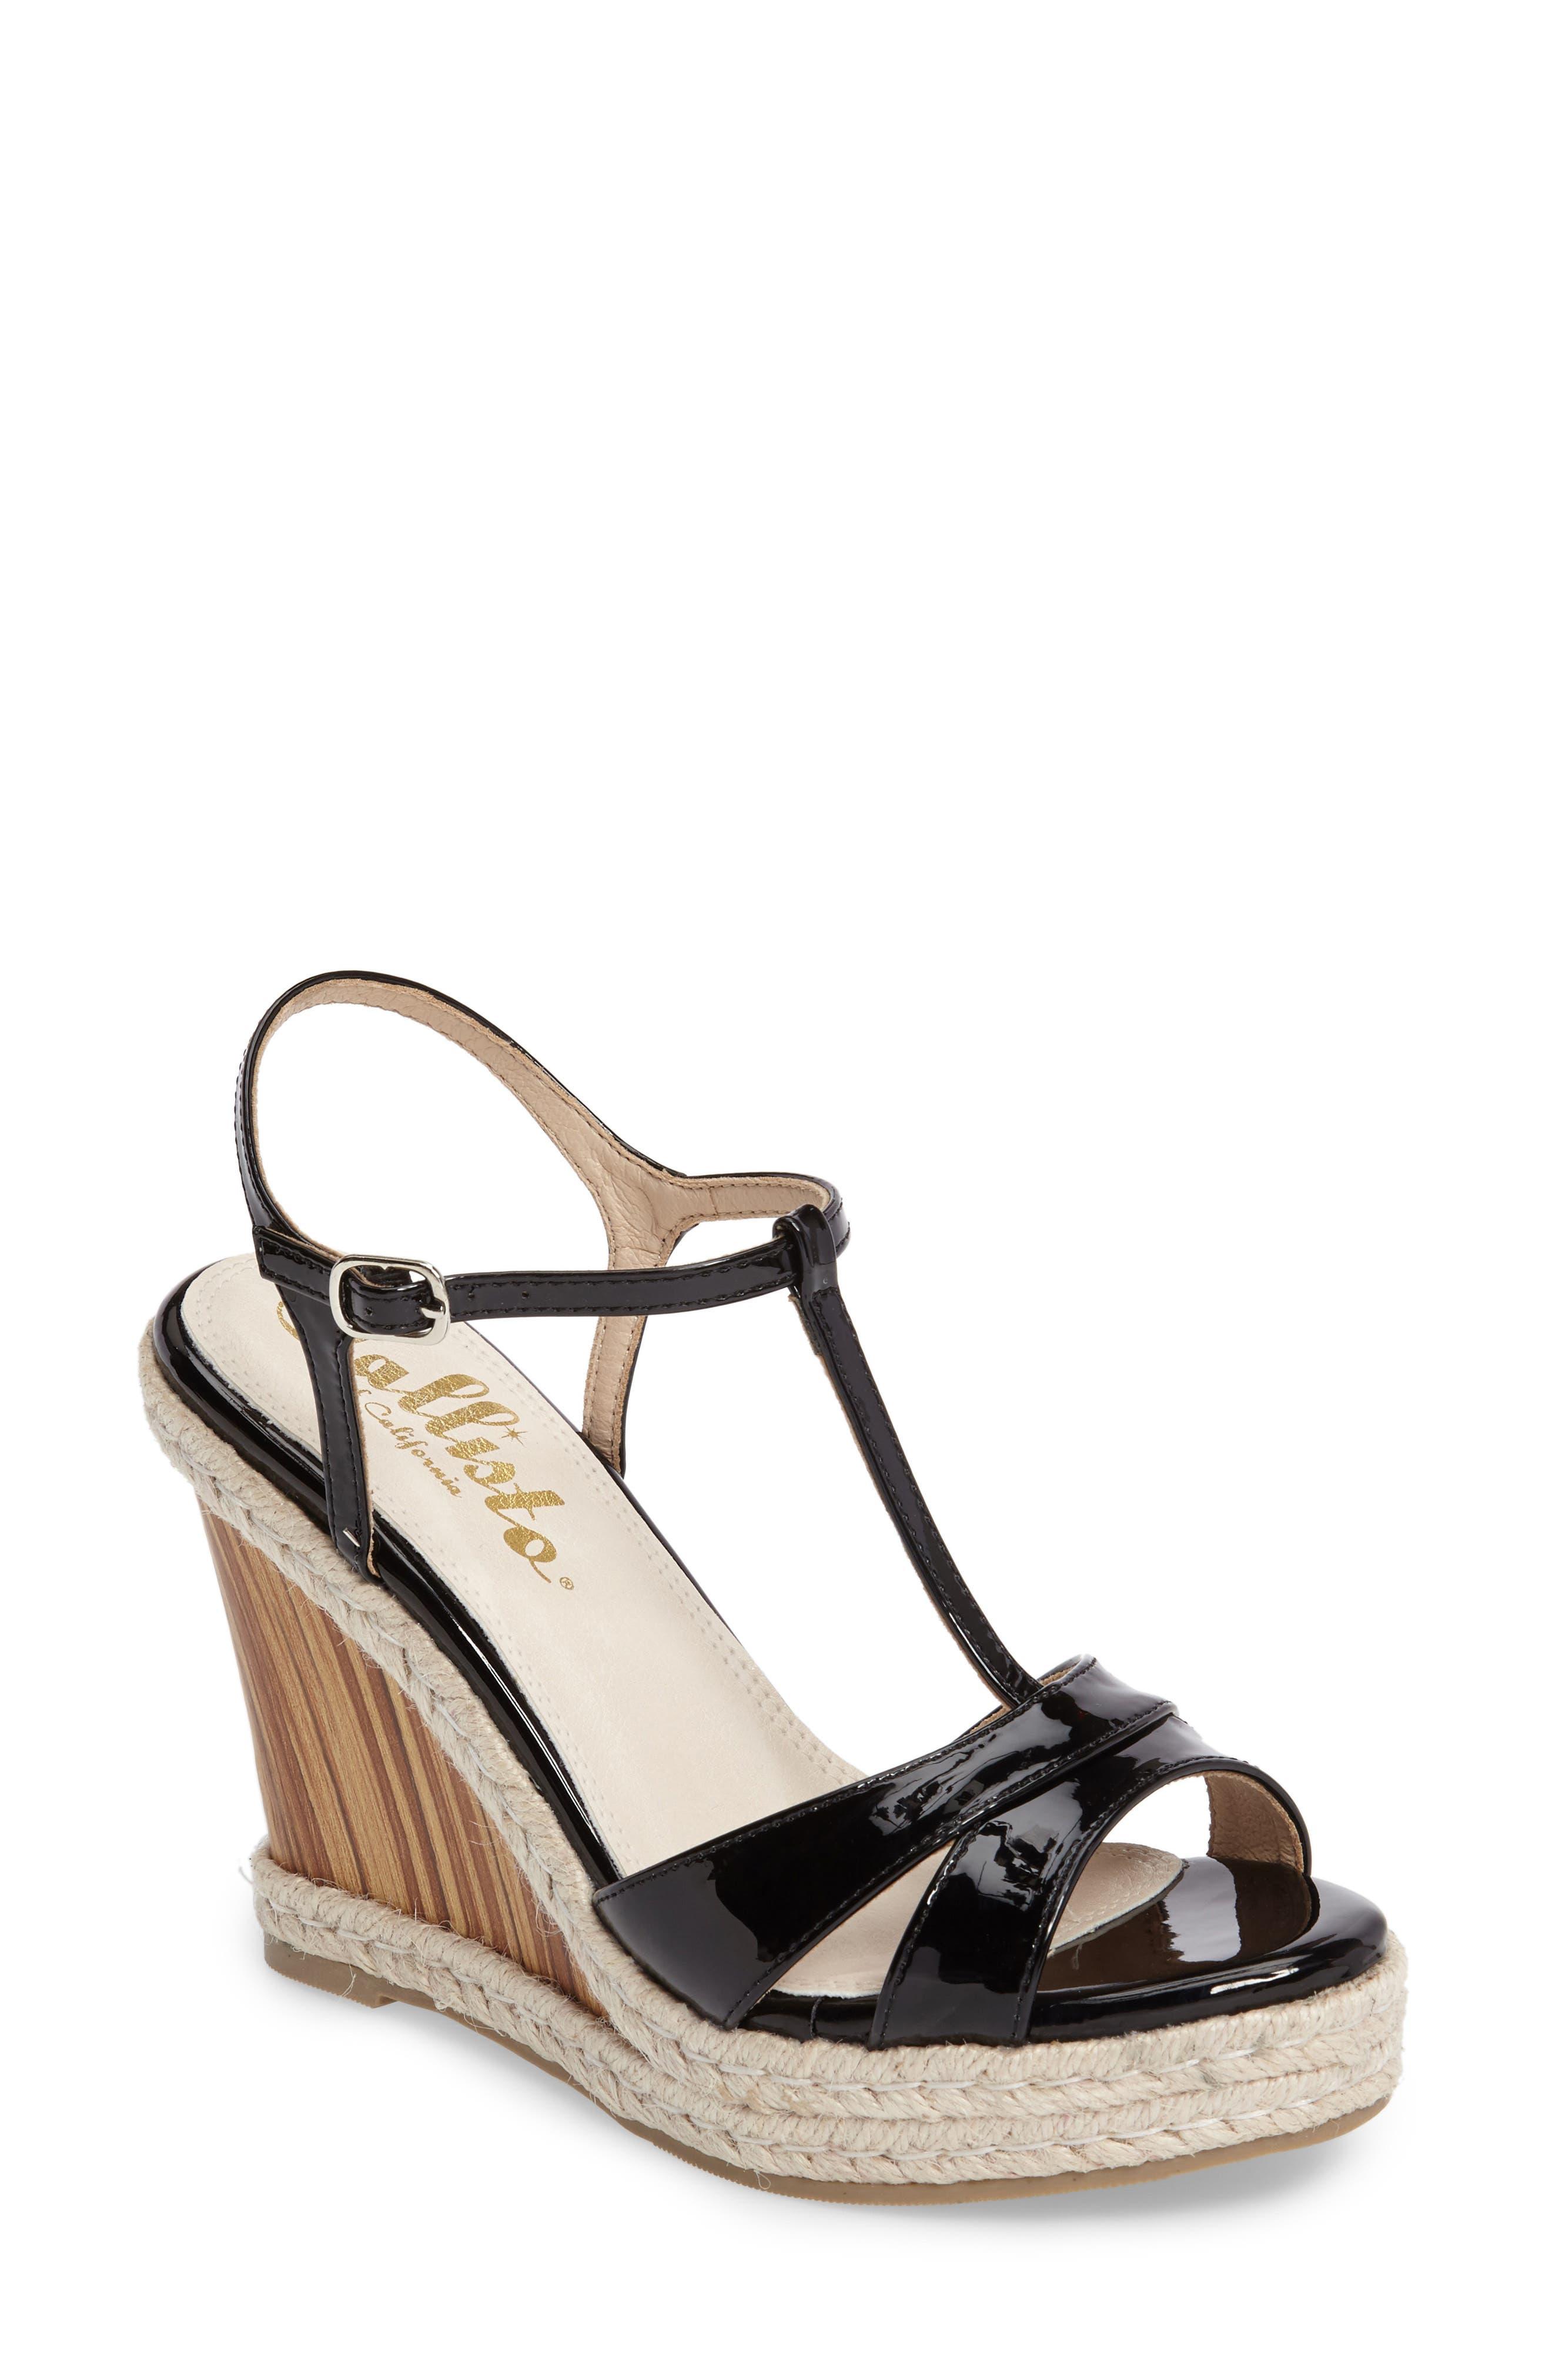 Main Image - Callisto Alinna T-Strap Wedge Sandal (Women)